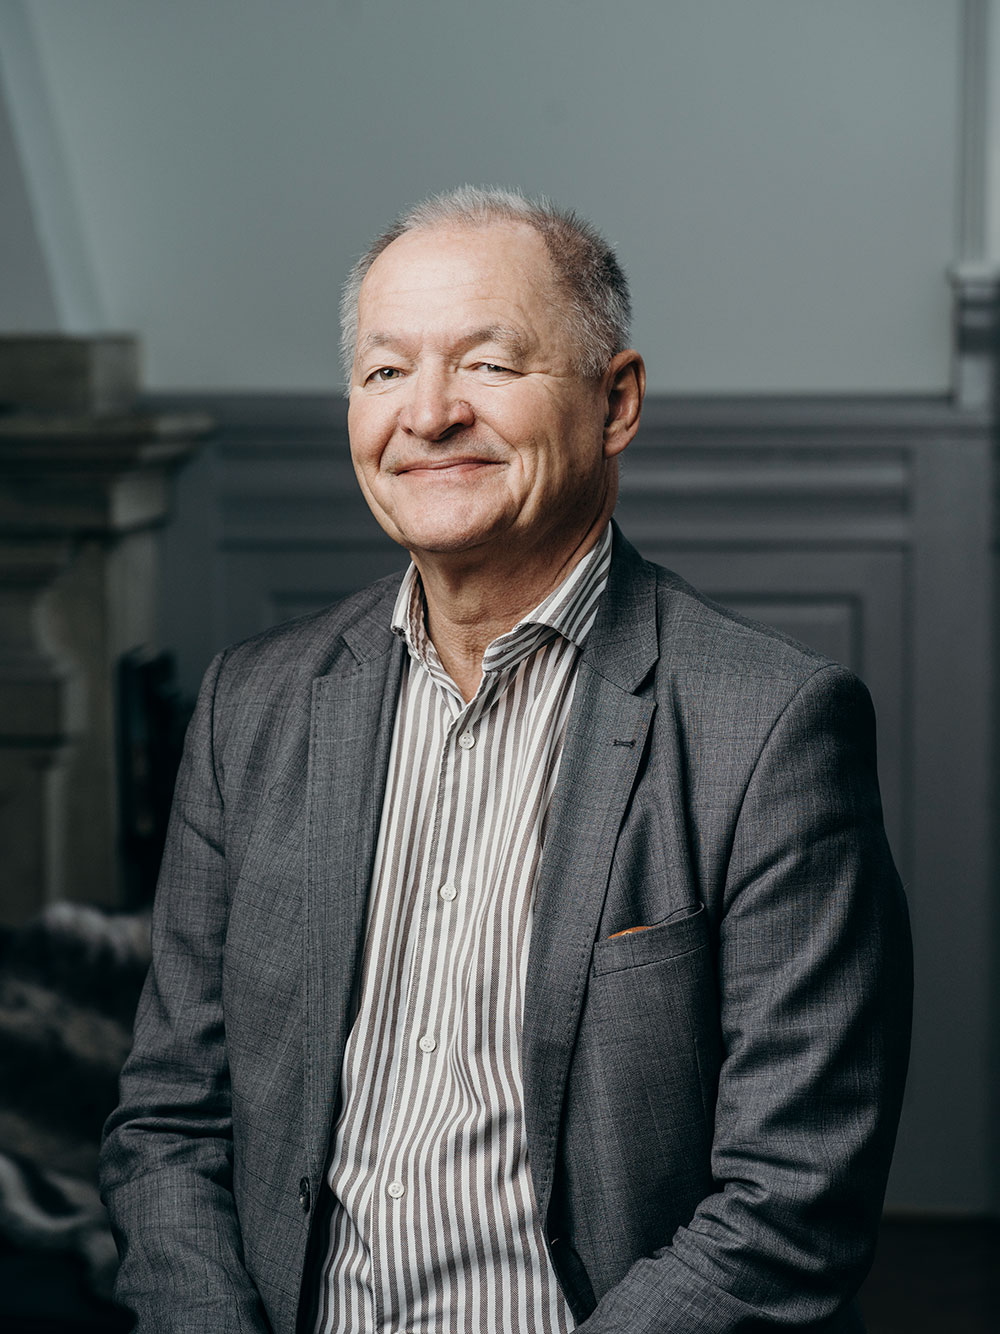 Björn Christoffersson